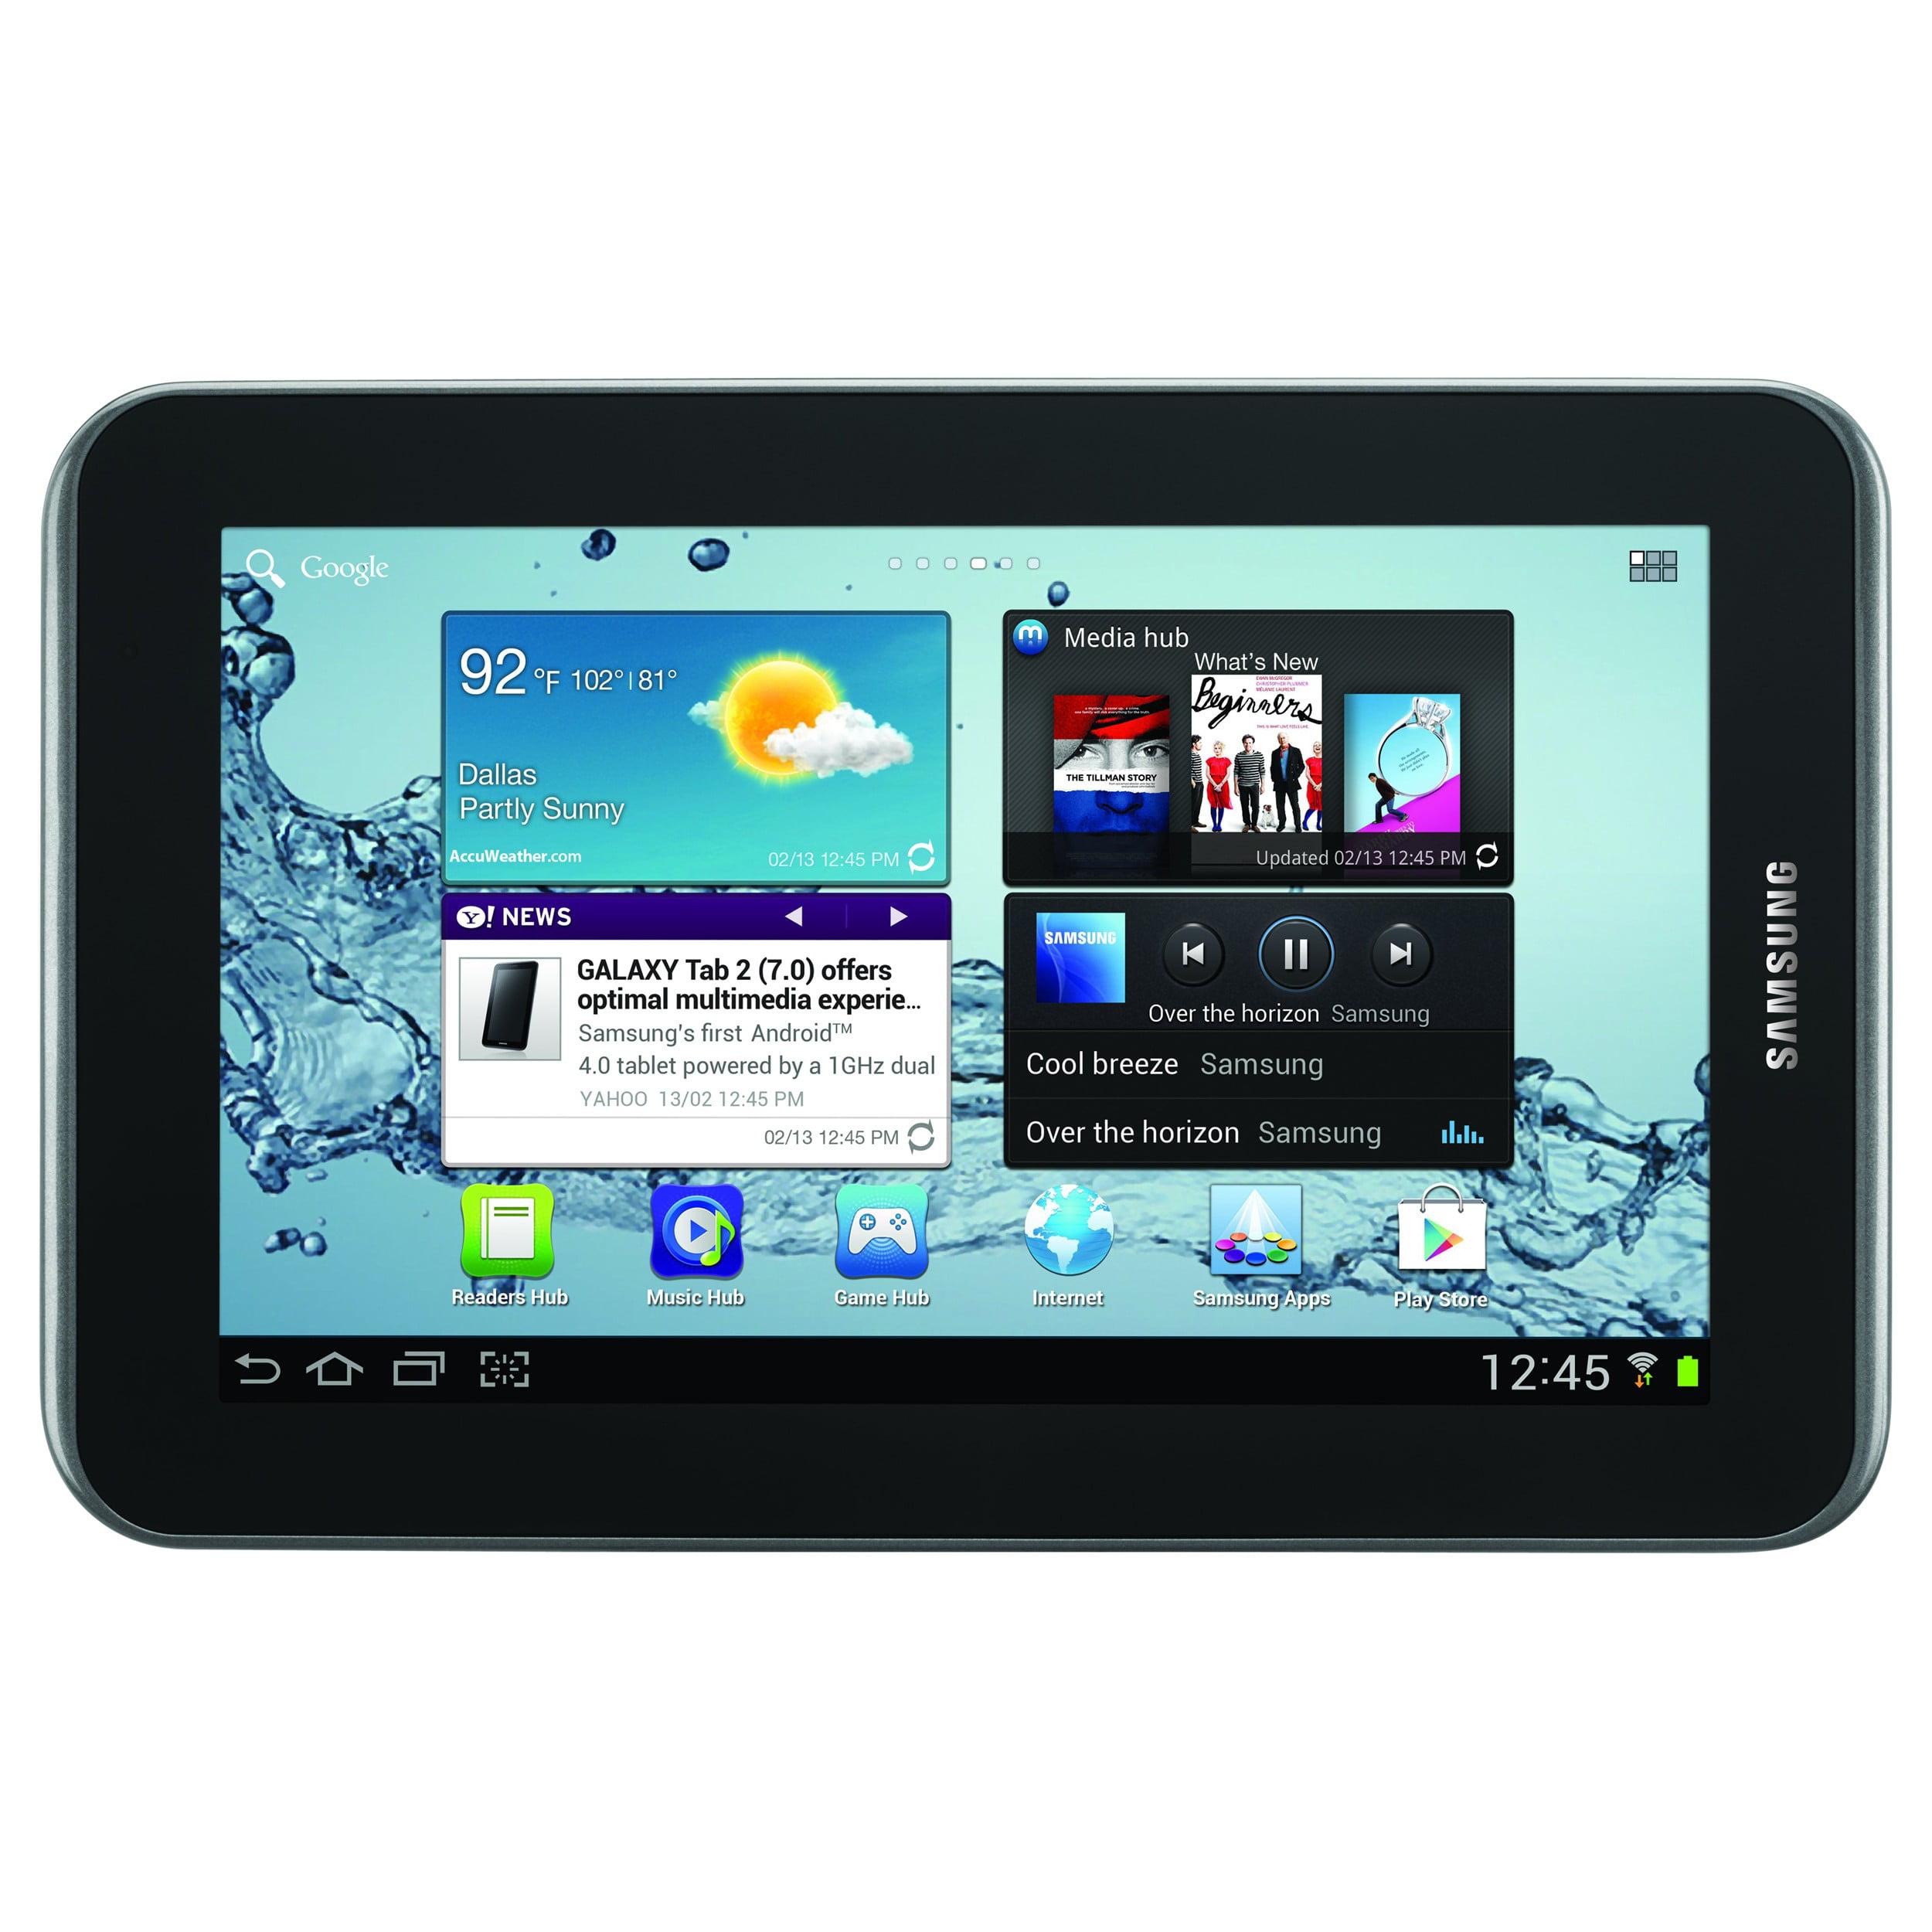 Samsung Tab 2 7.0 Lte Verizon